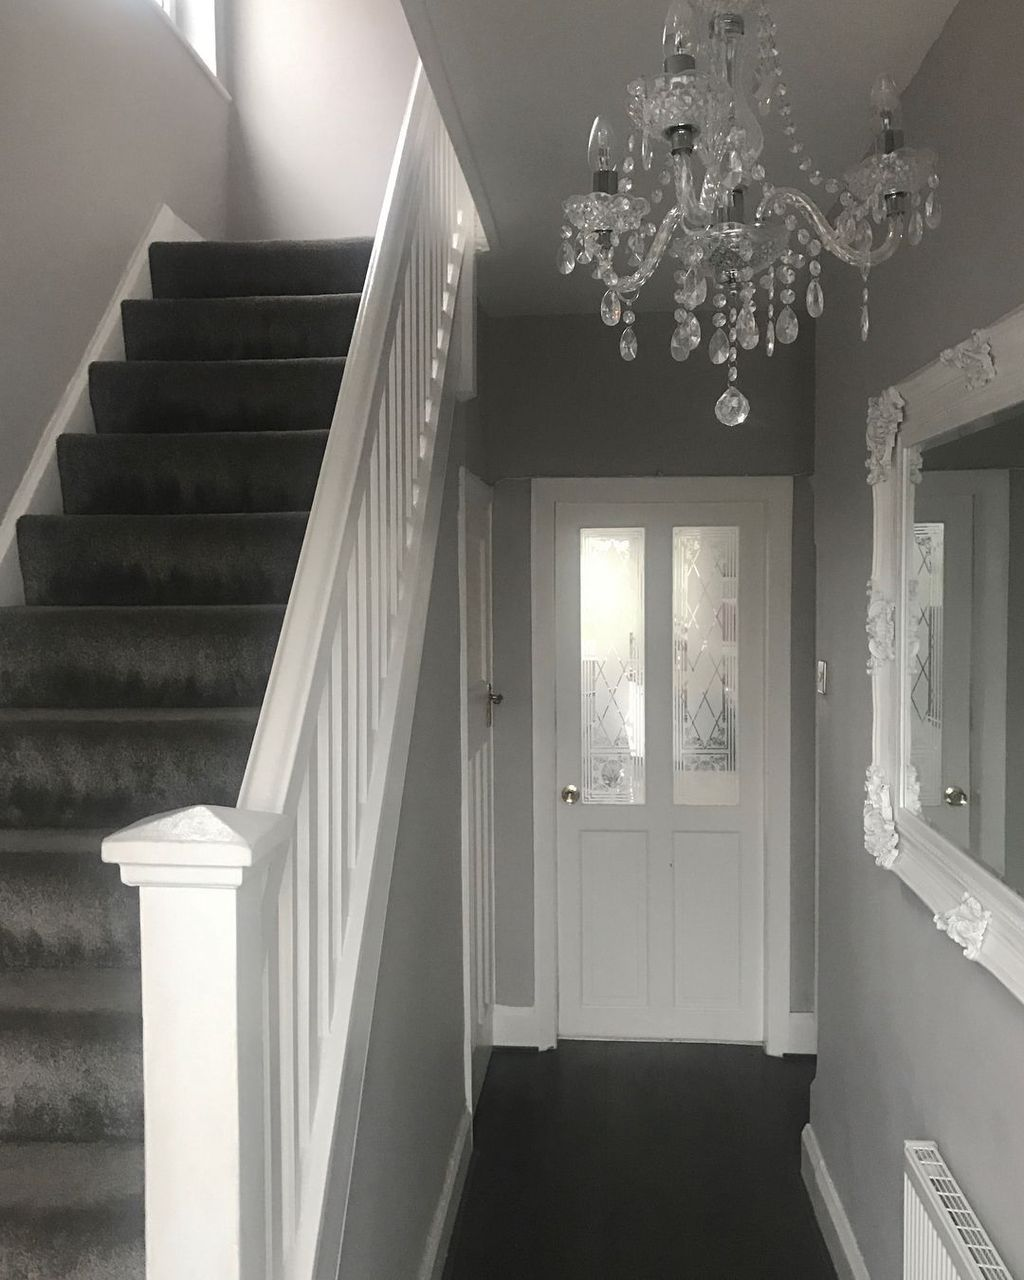 Best 30 Relaxing Mirror Designs Ideas For Hallway Hallway 400 x 300